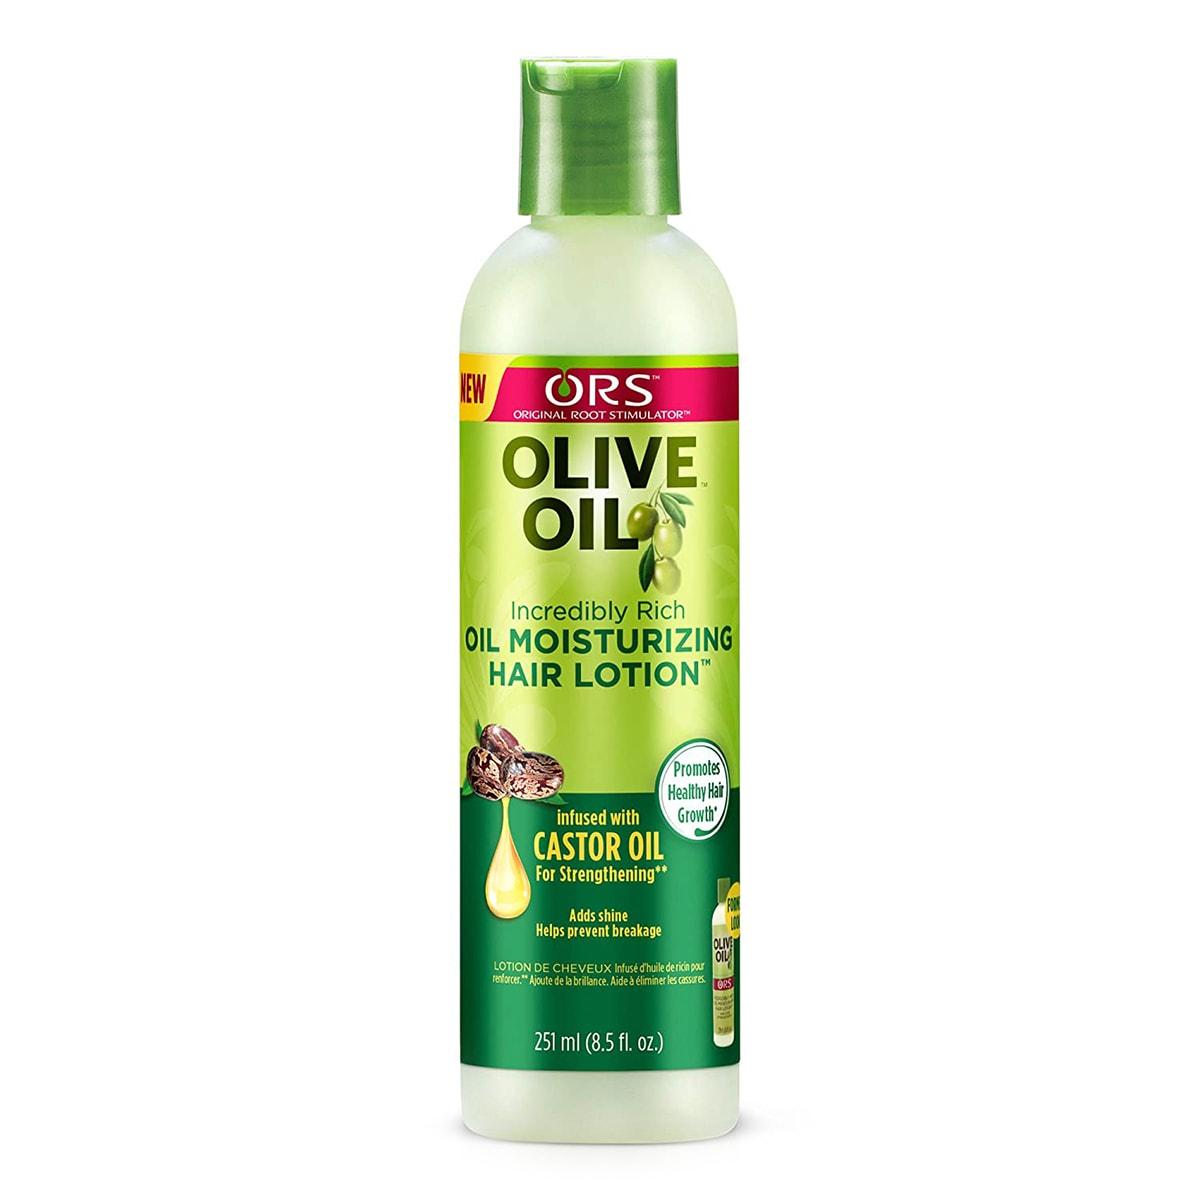 Buy Organic Root Stimulator (ORS) Olive Oil Moisturizing Hair Lotion - 251 ml